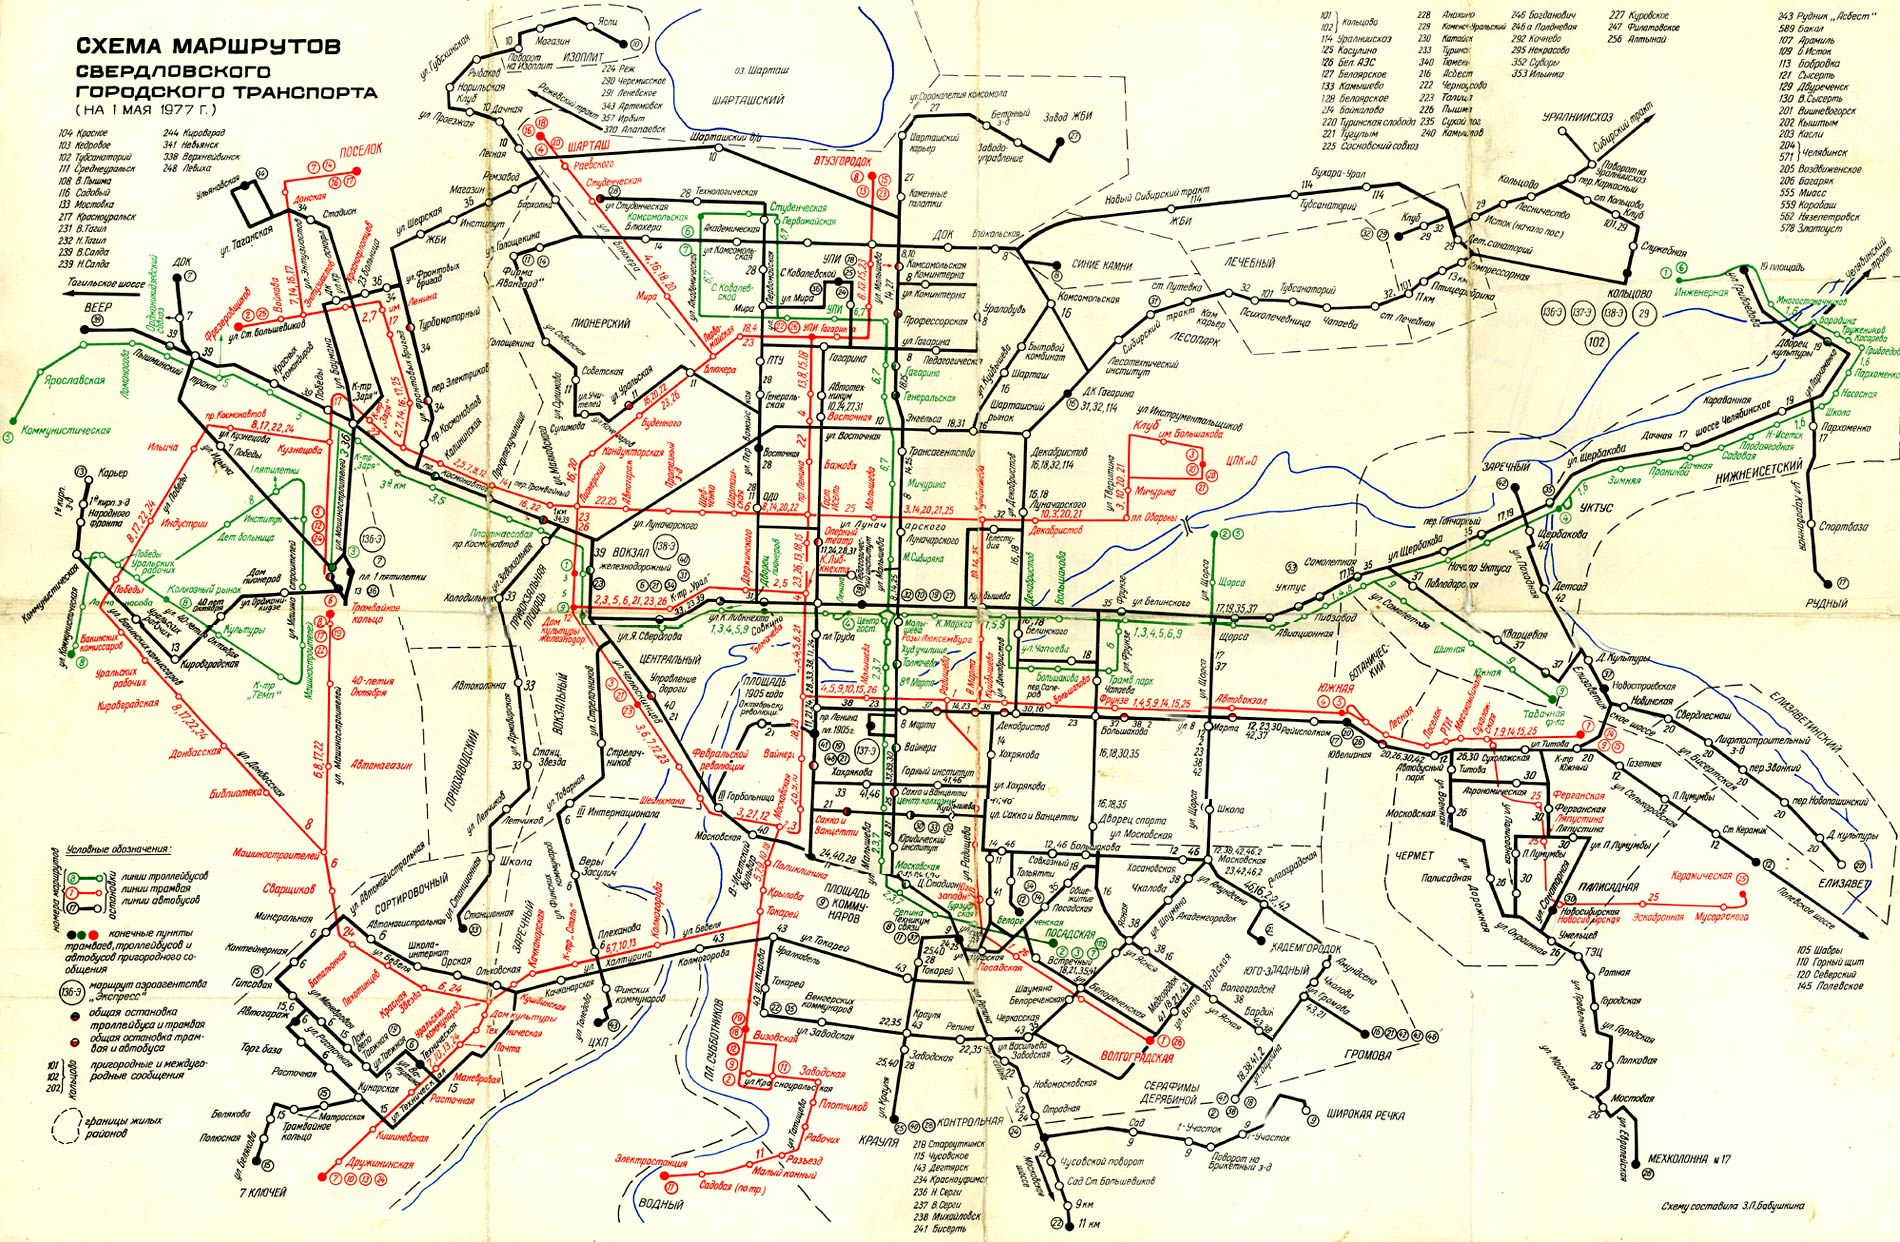 Схема городского транспорта на карте